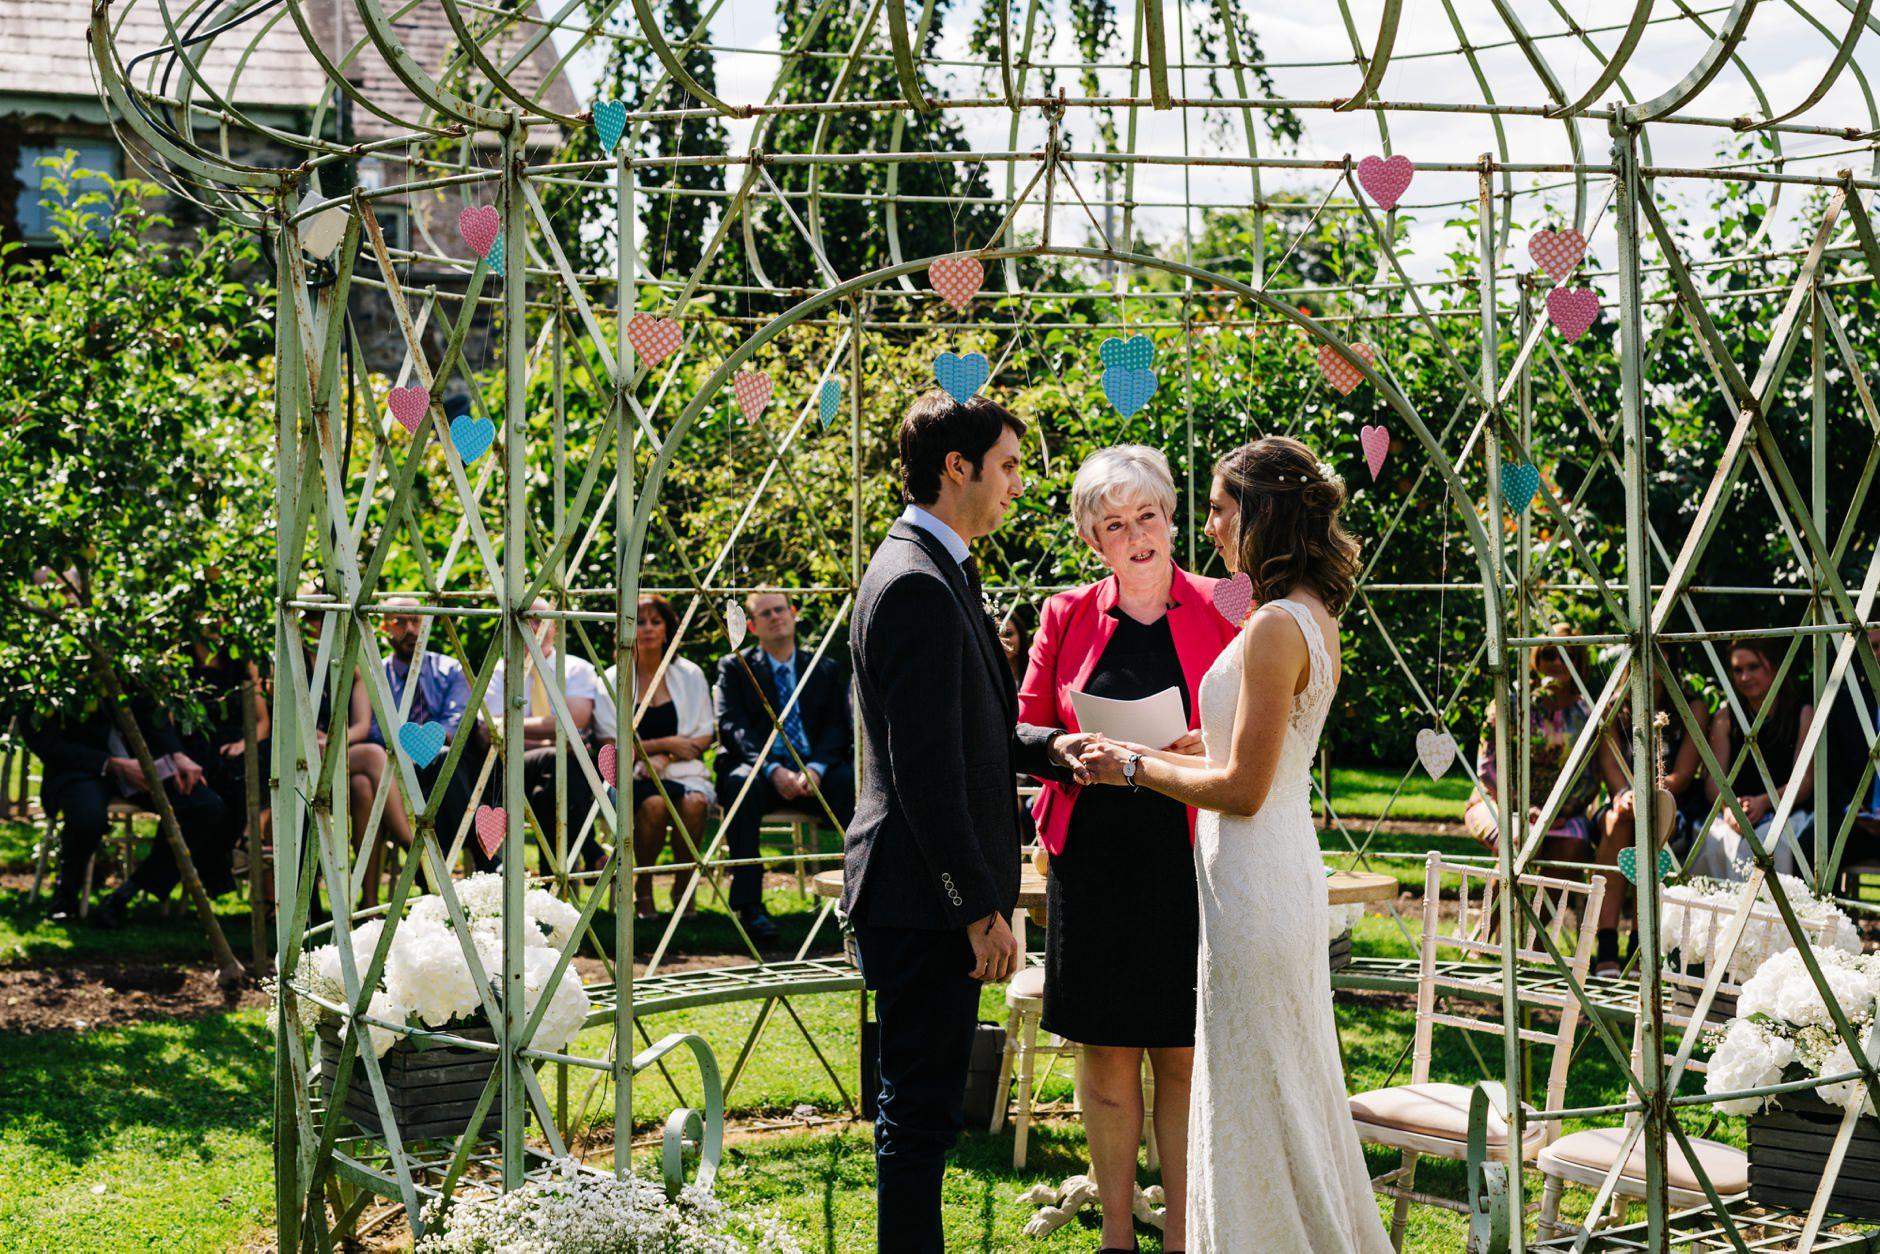 wedding photographer ireland outdoor ceremony hand binding